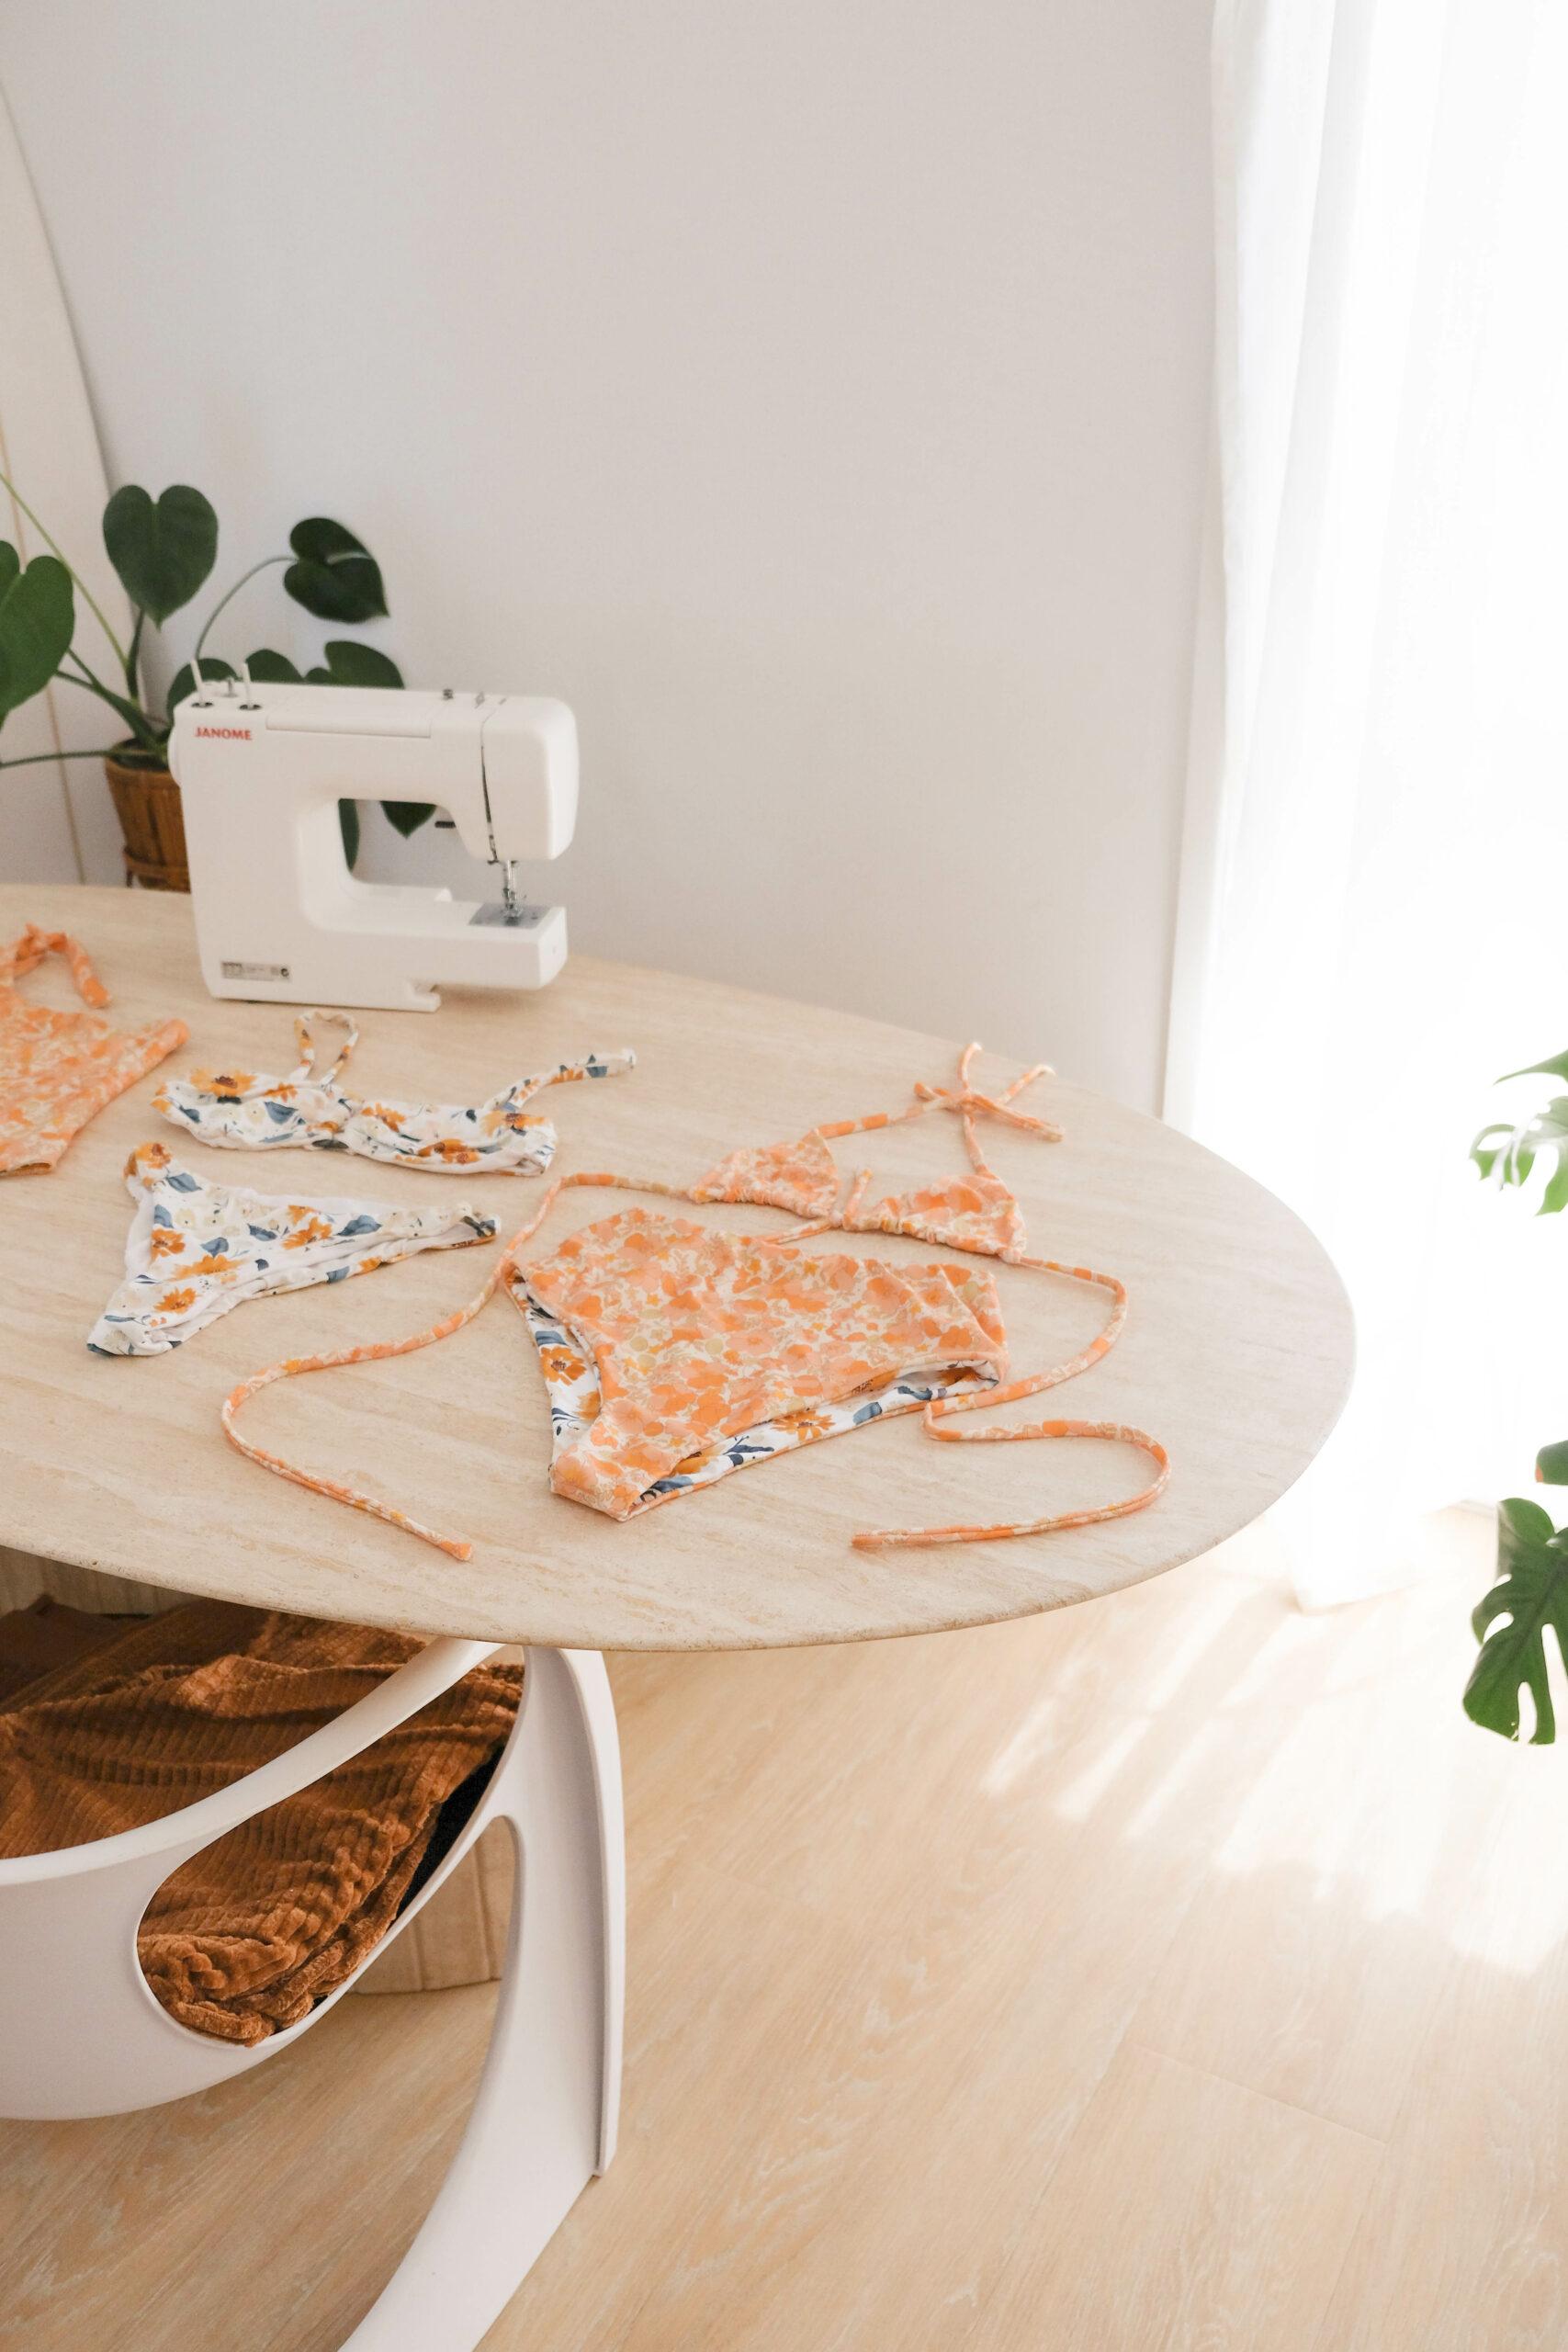 A reversible handmade bikini on a table near a sewing machine